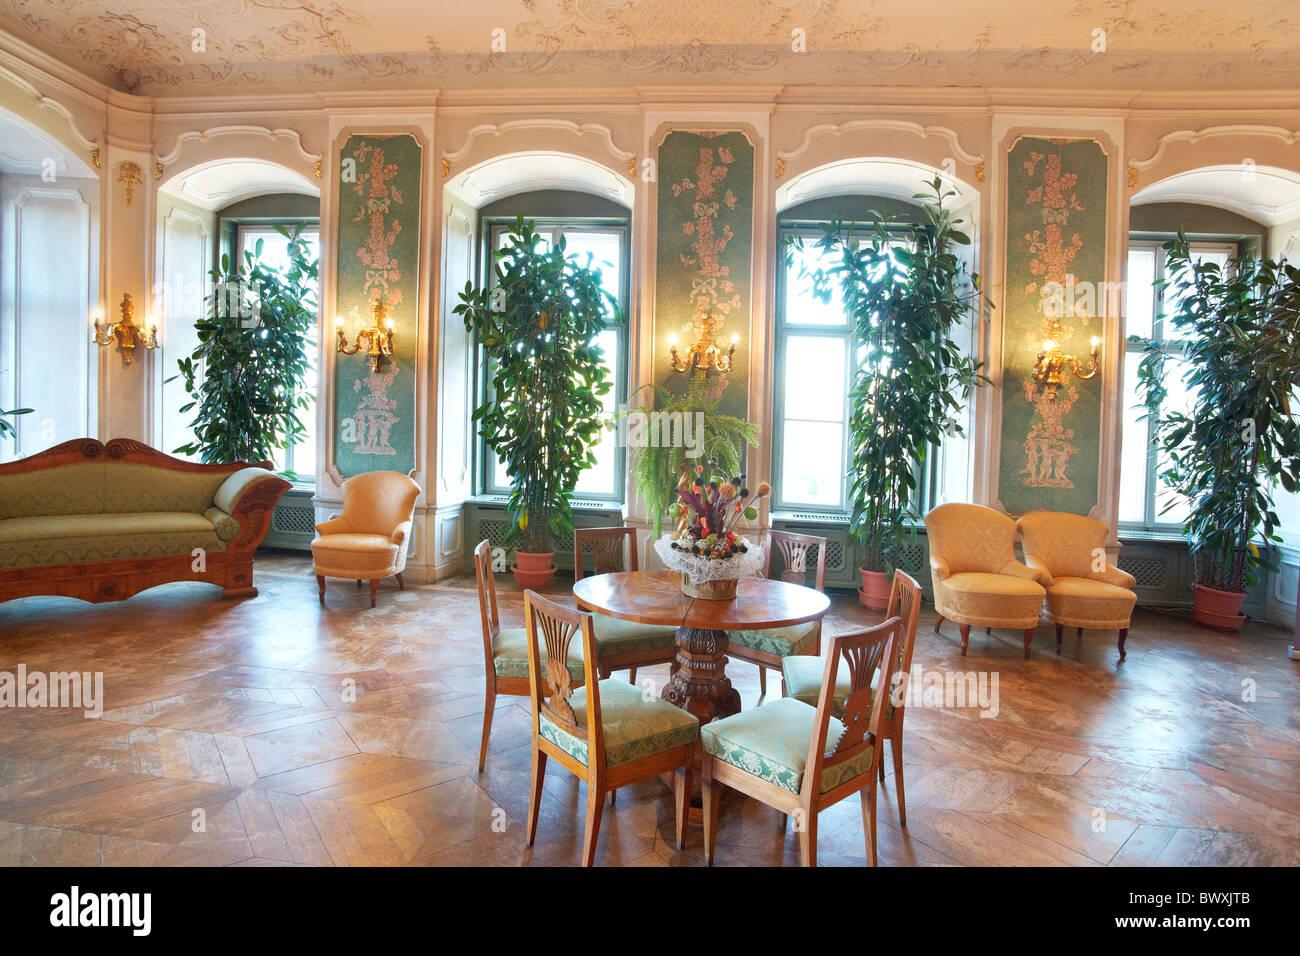 ksiaz castle - interior - green hall, sudeten mountains, silesia